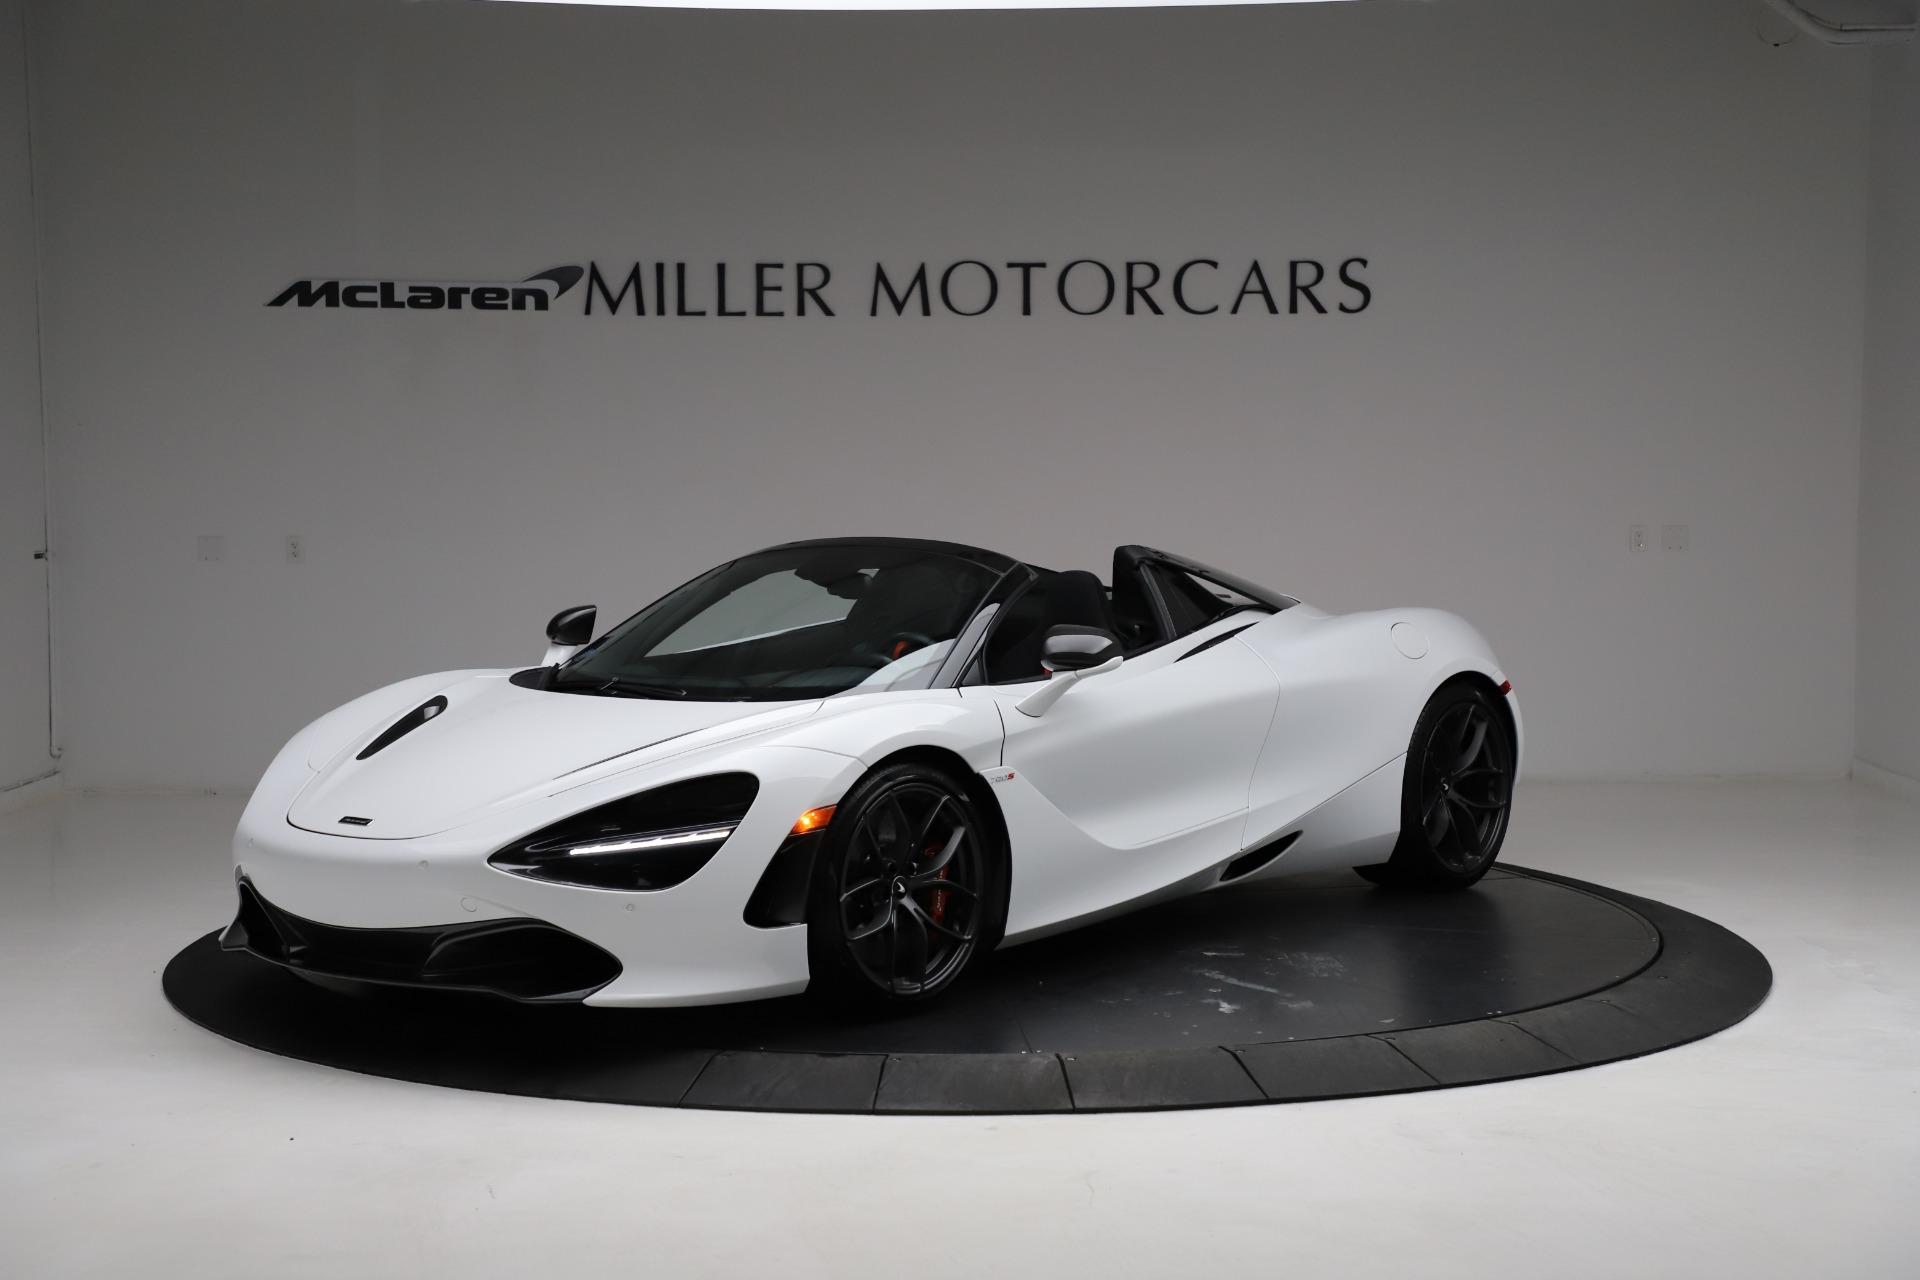 Used 2020 McLaren 720S Spider for sale Sold at Maserati of Westport in Westport CT 06880 1